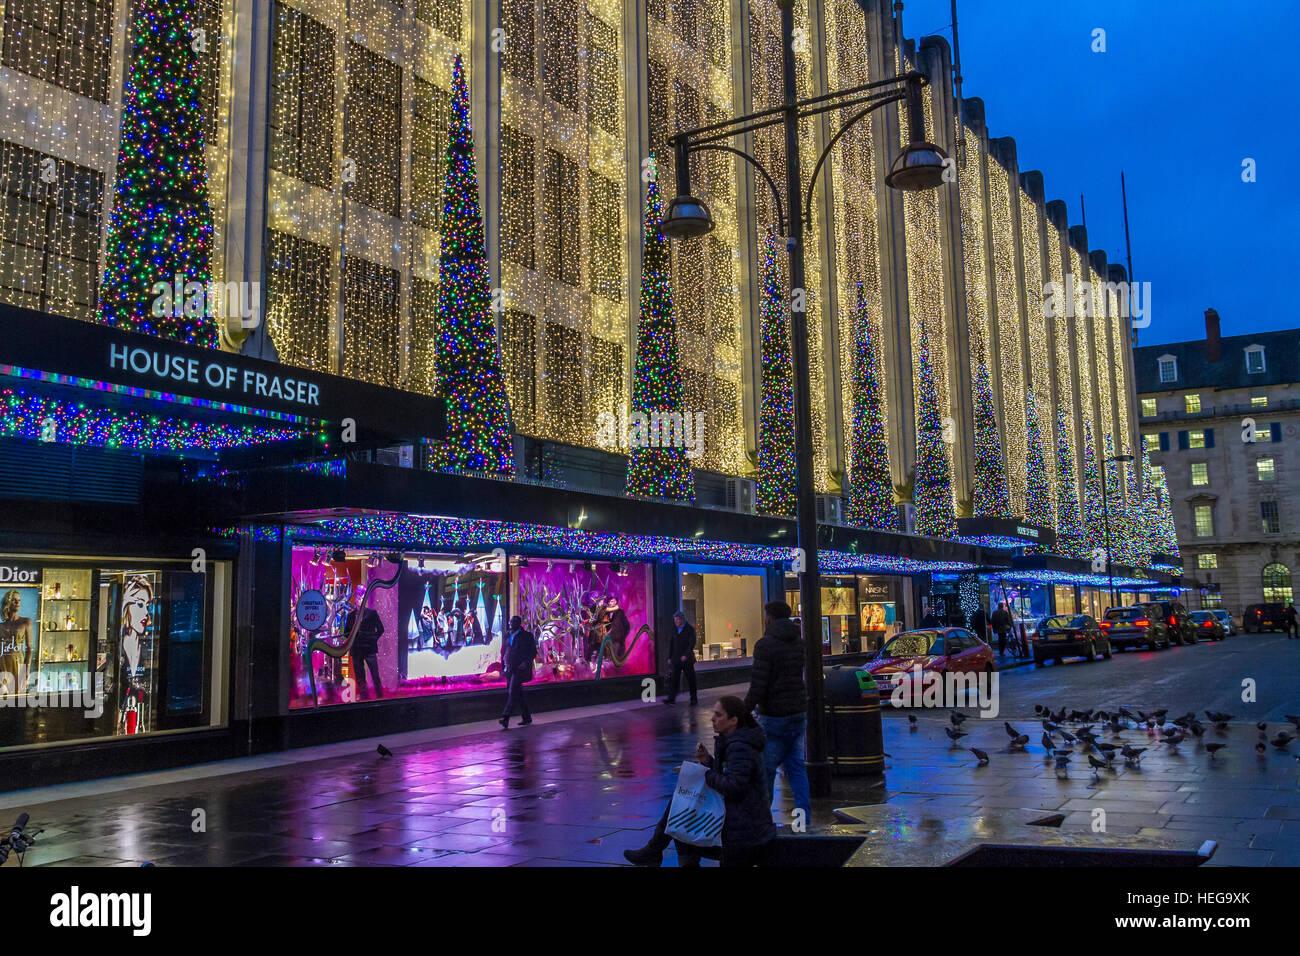 House Of Fraser ,Oxford St , Christmas Lights ,London - Stock Image